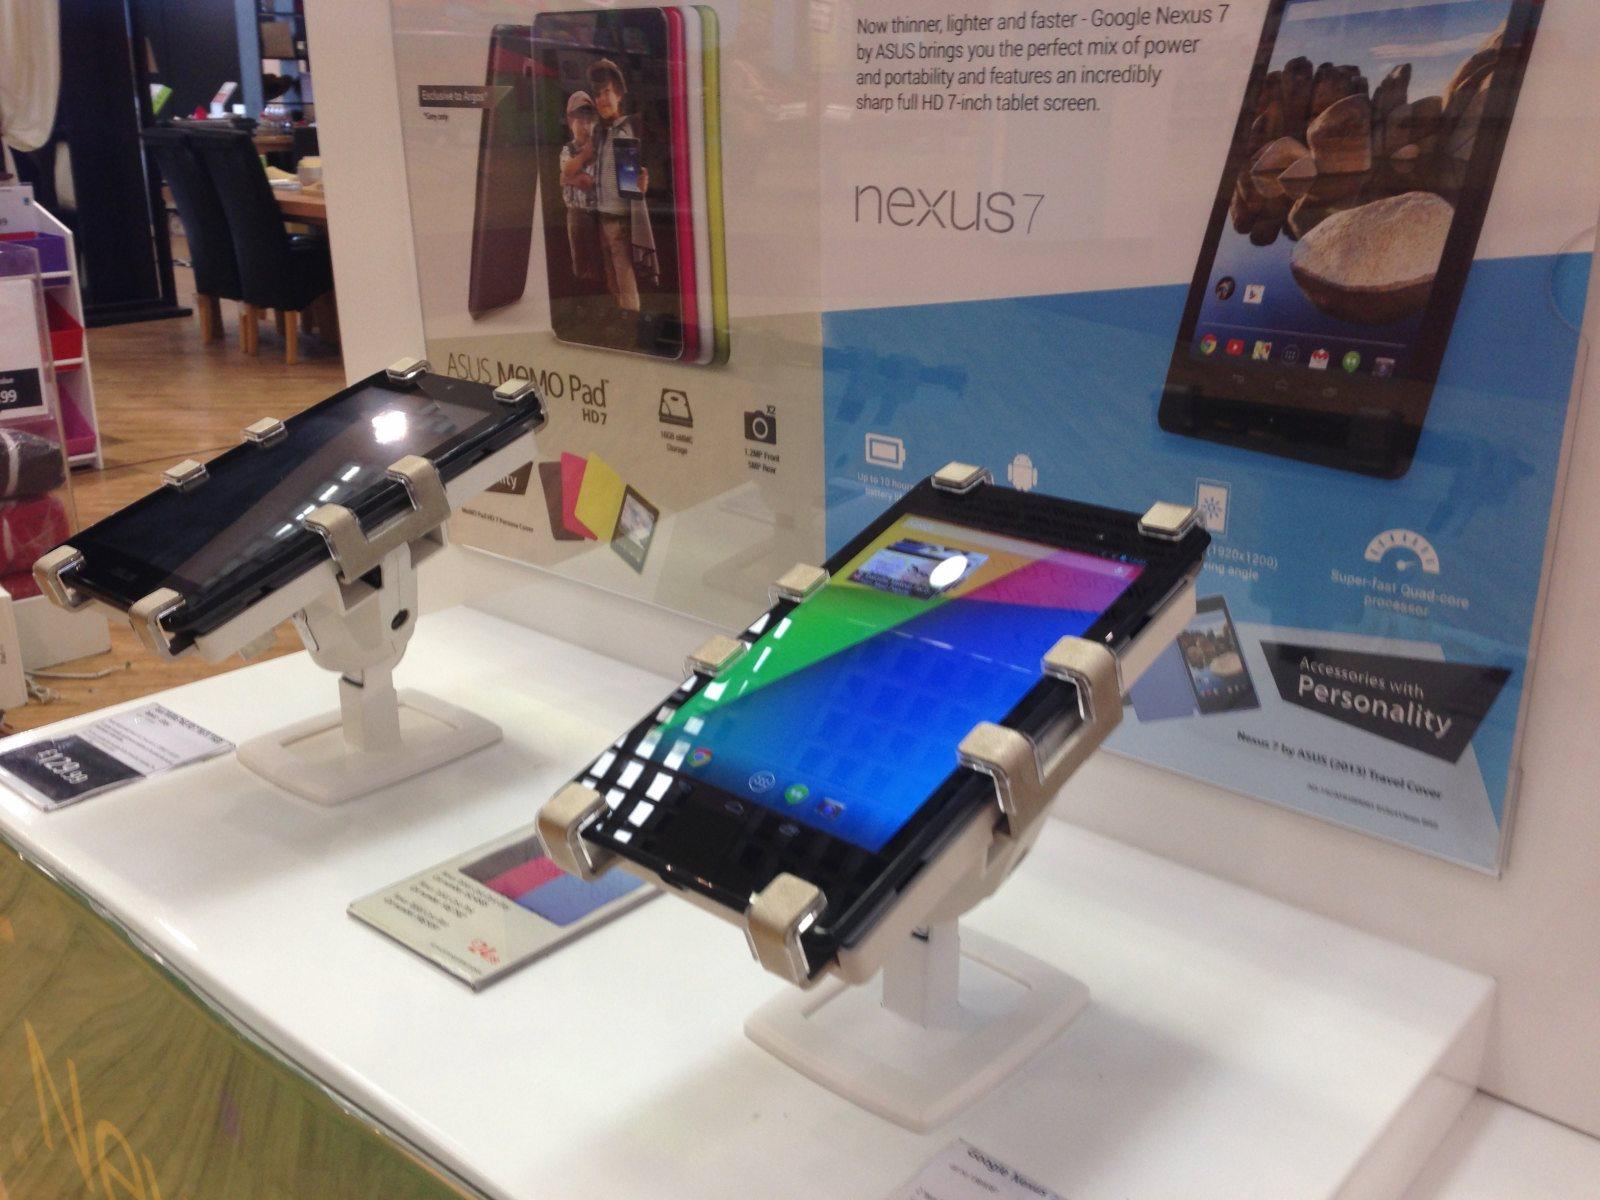 gripzo-2-ipad-tablets-2.jpg